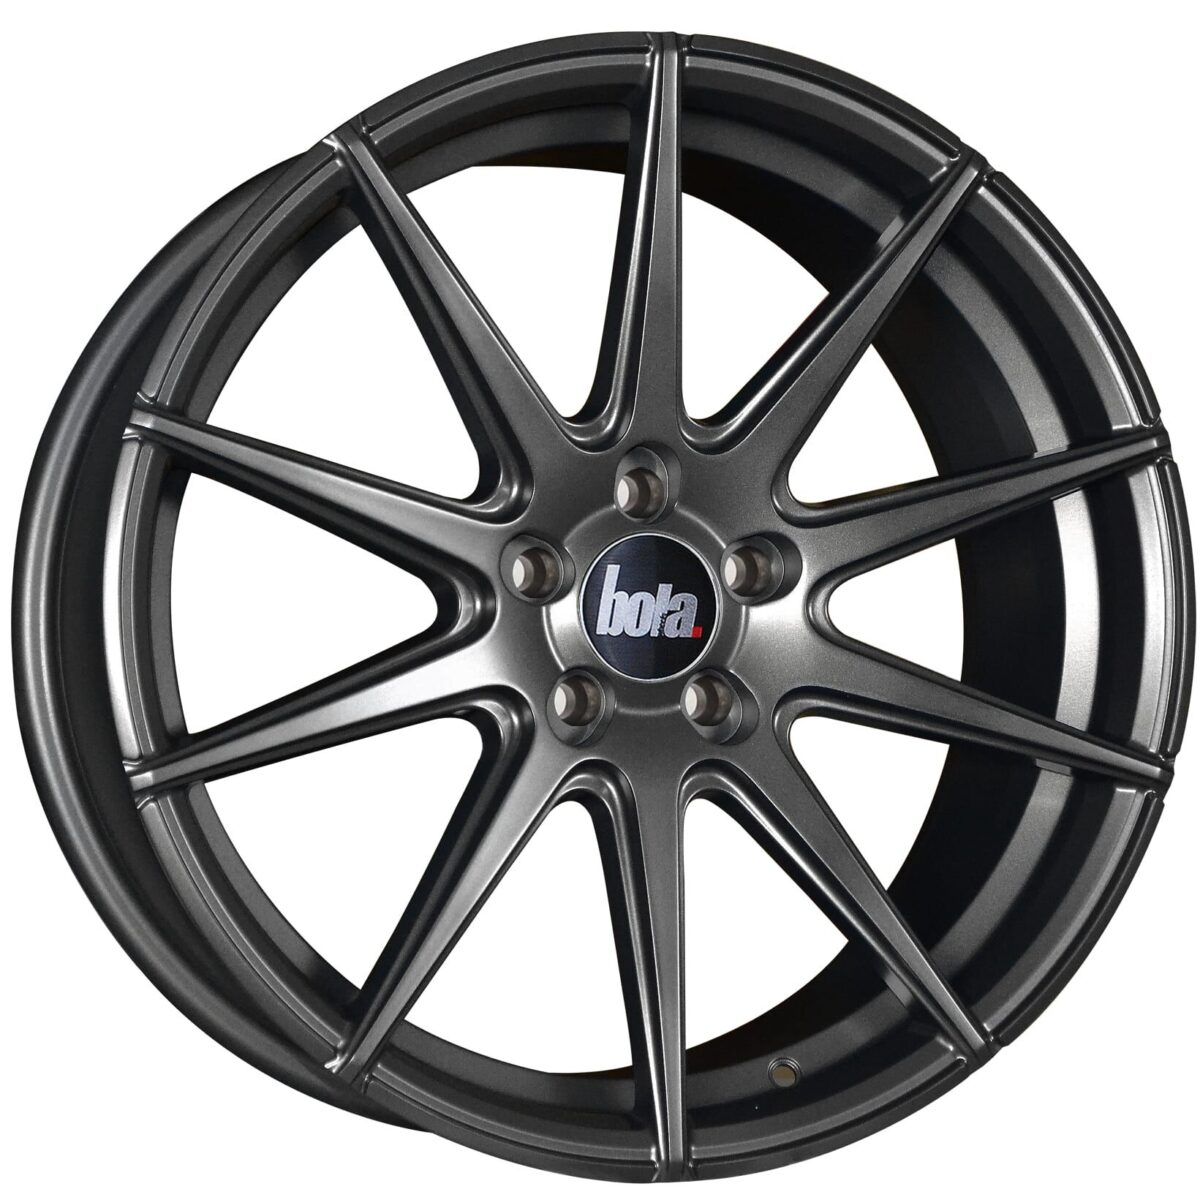 "19"" BOLA CSR Wheels - Matt Gunmetal - All BMW Models"